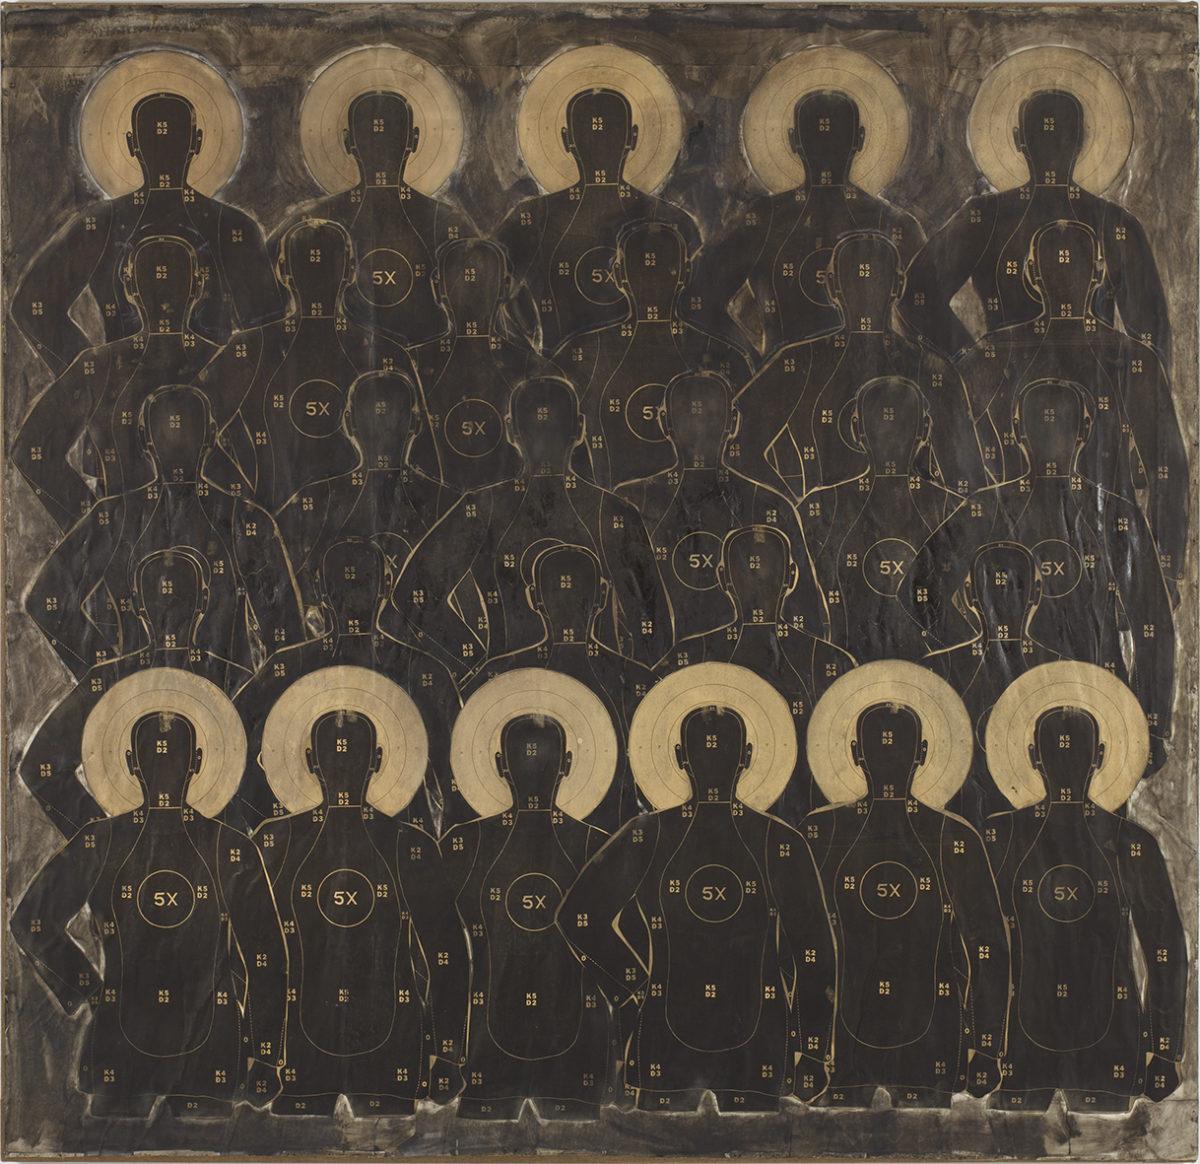 Philip Taaffe, Martyr Group, 1083. Albertina Sammlung Jablonka